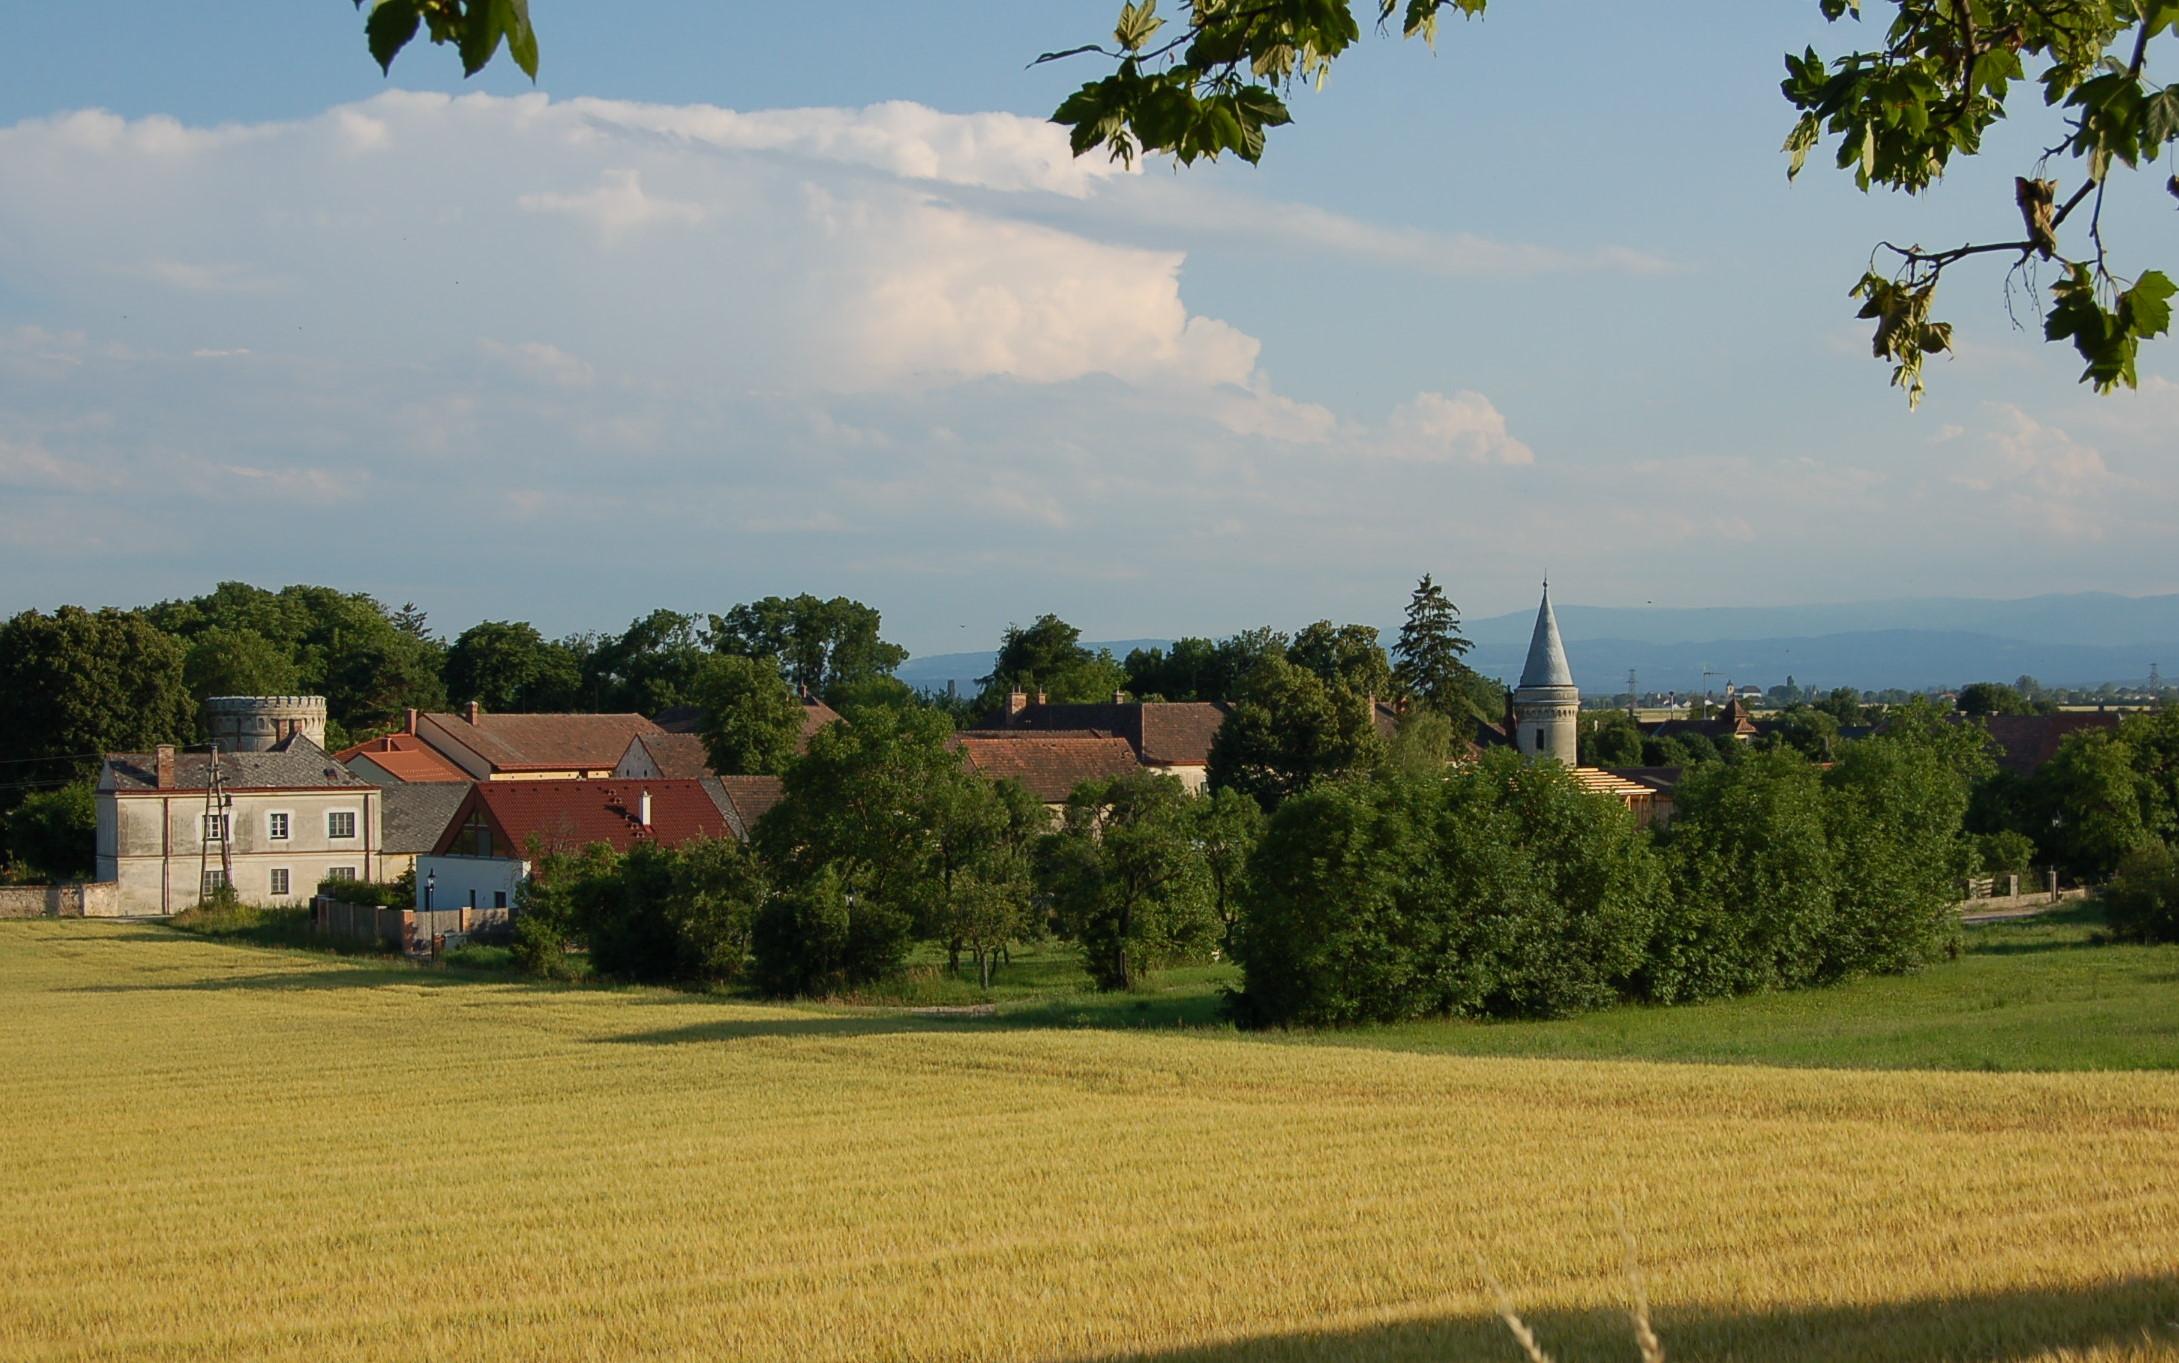 Mllabfuhrkalender - Bad Fischau-Brunn